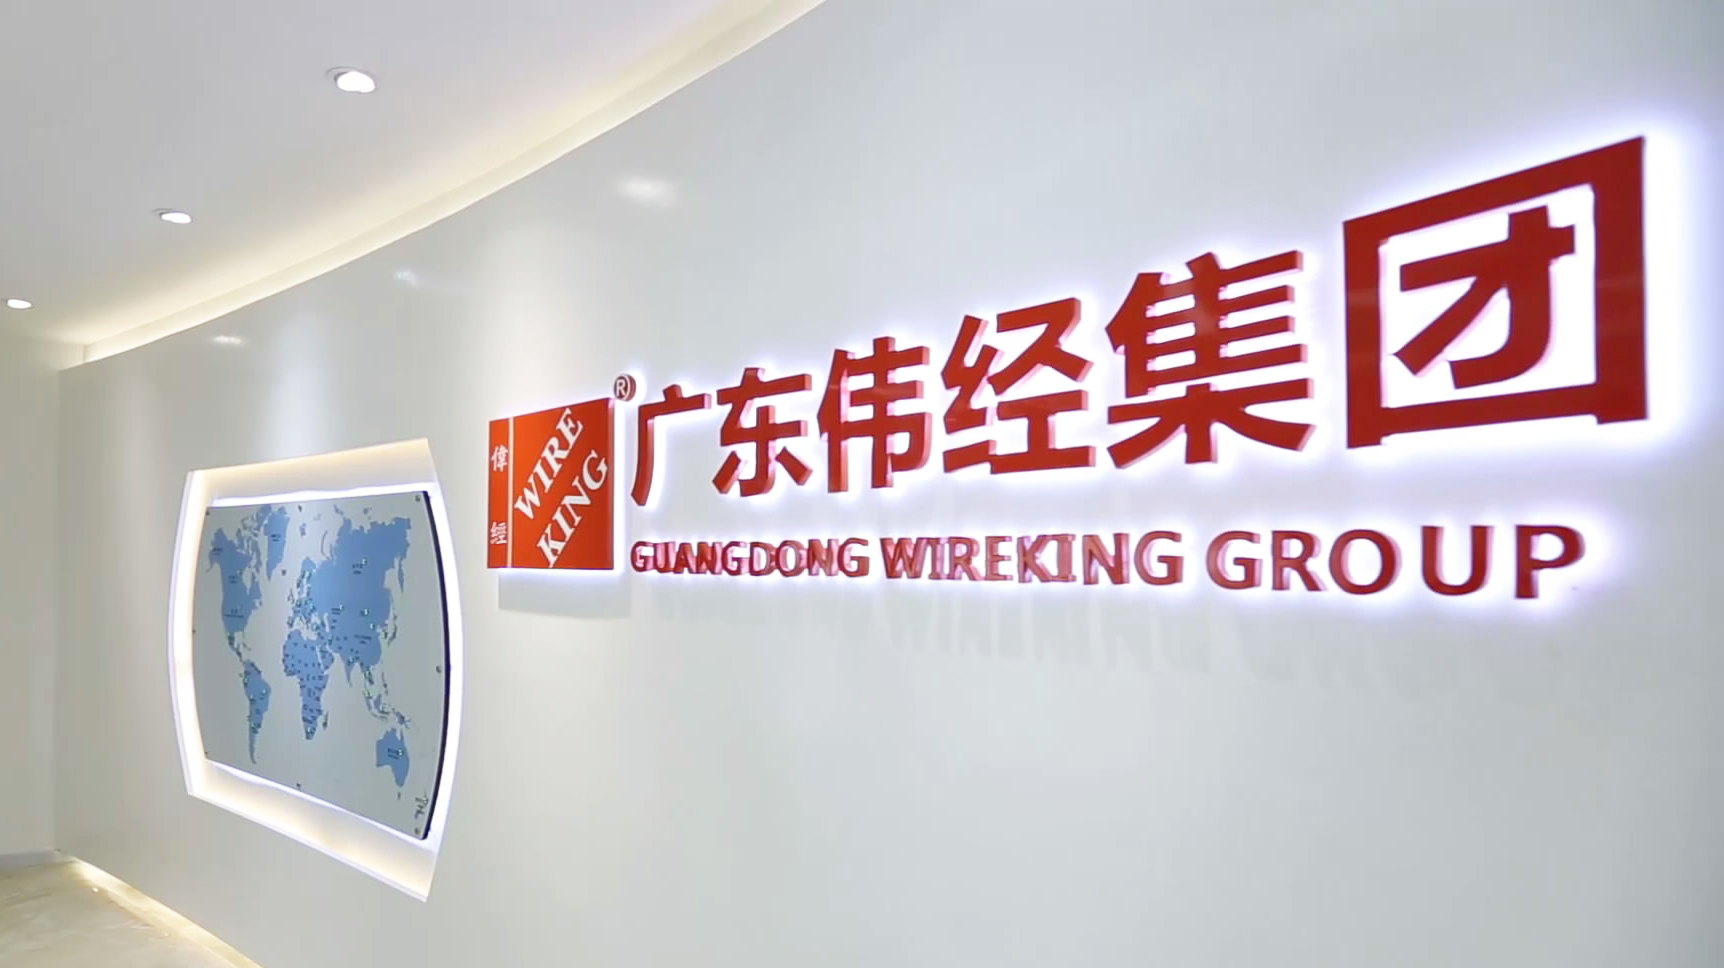 Wireking enterprise promotion film